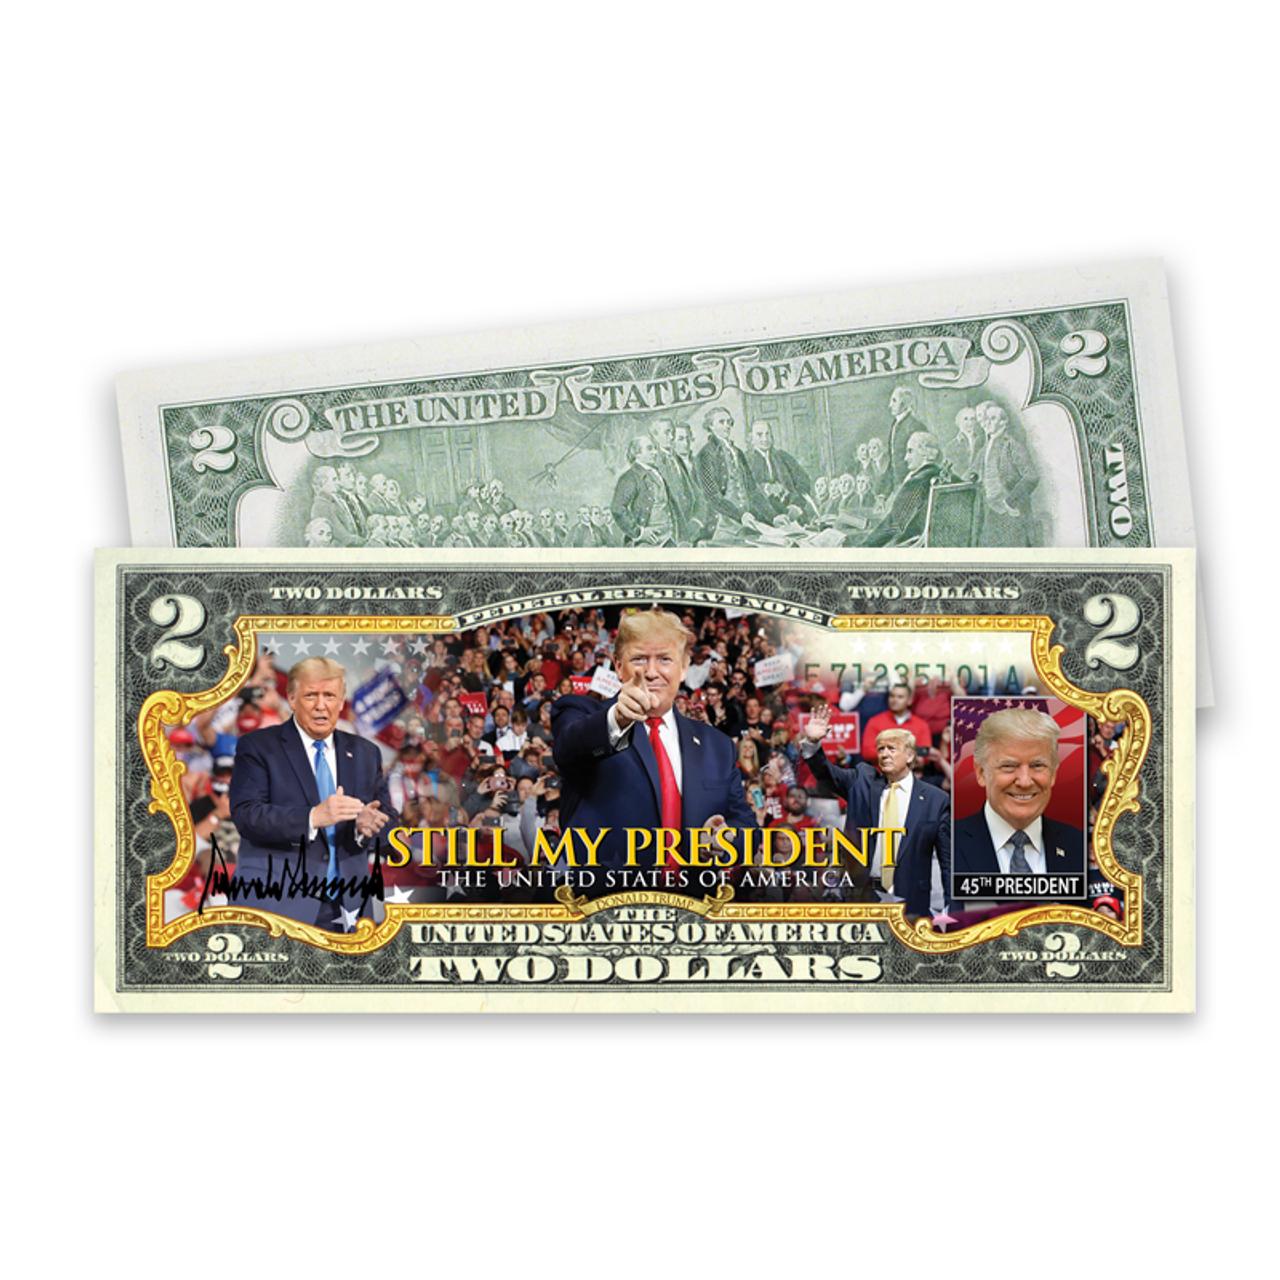 Trump 2021 Presidential $2 Bill